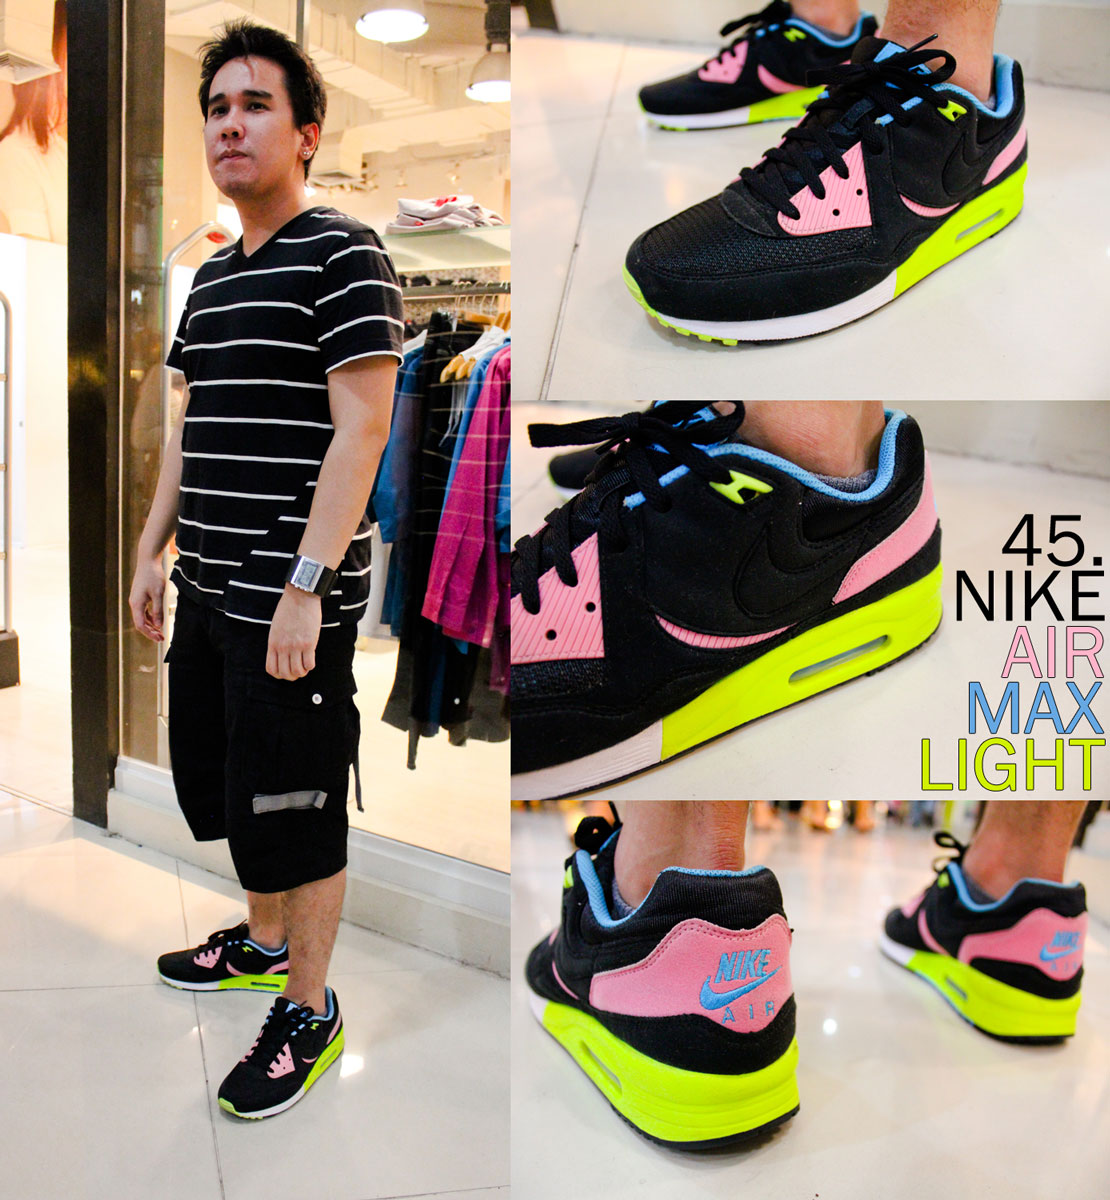 Astron Sneaker Hunts: 45. Nike Air Max Light